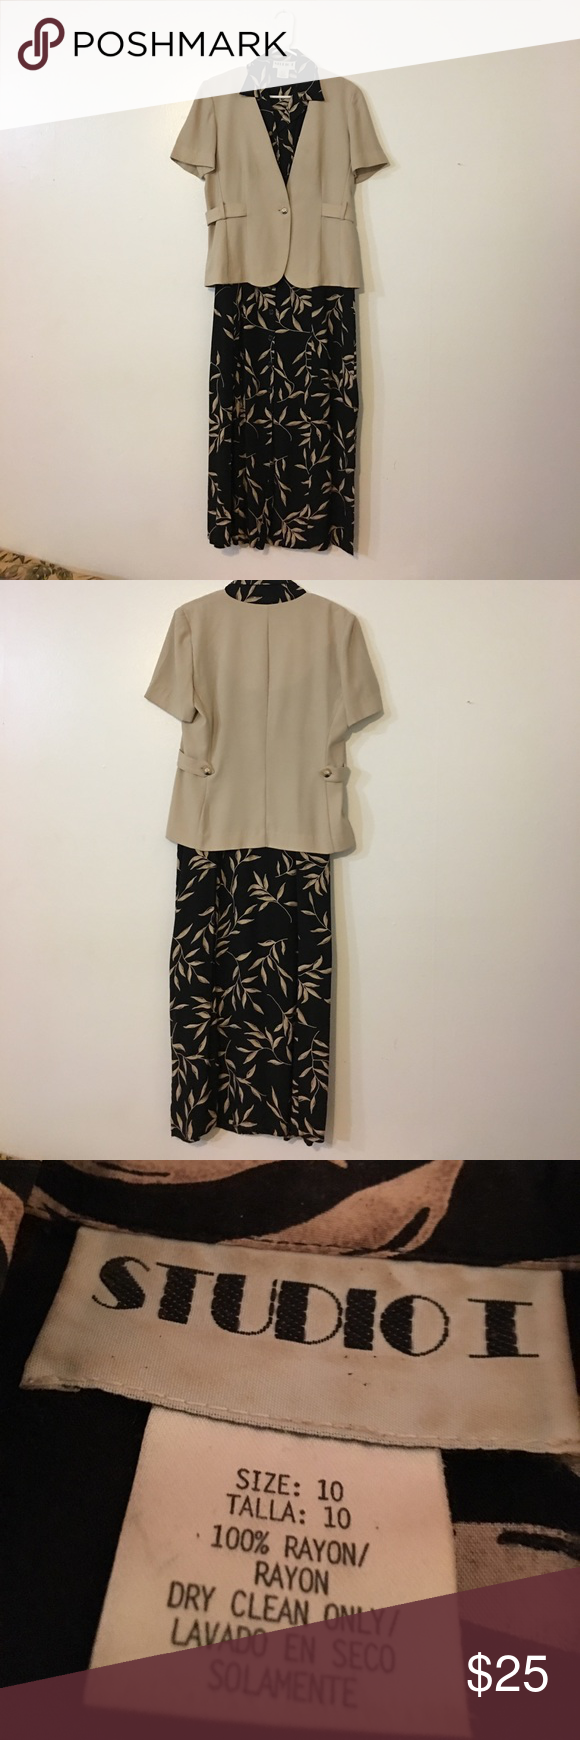 Two Piece Printed Dress With Jacket Print Dress Jacket Dress Dresses [ 1740 x 580 Pixel ]